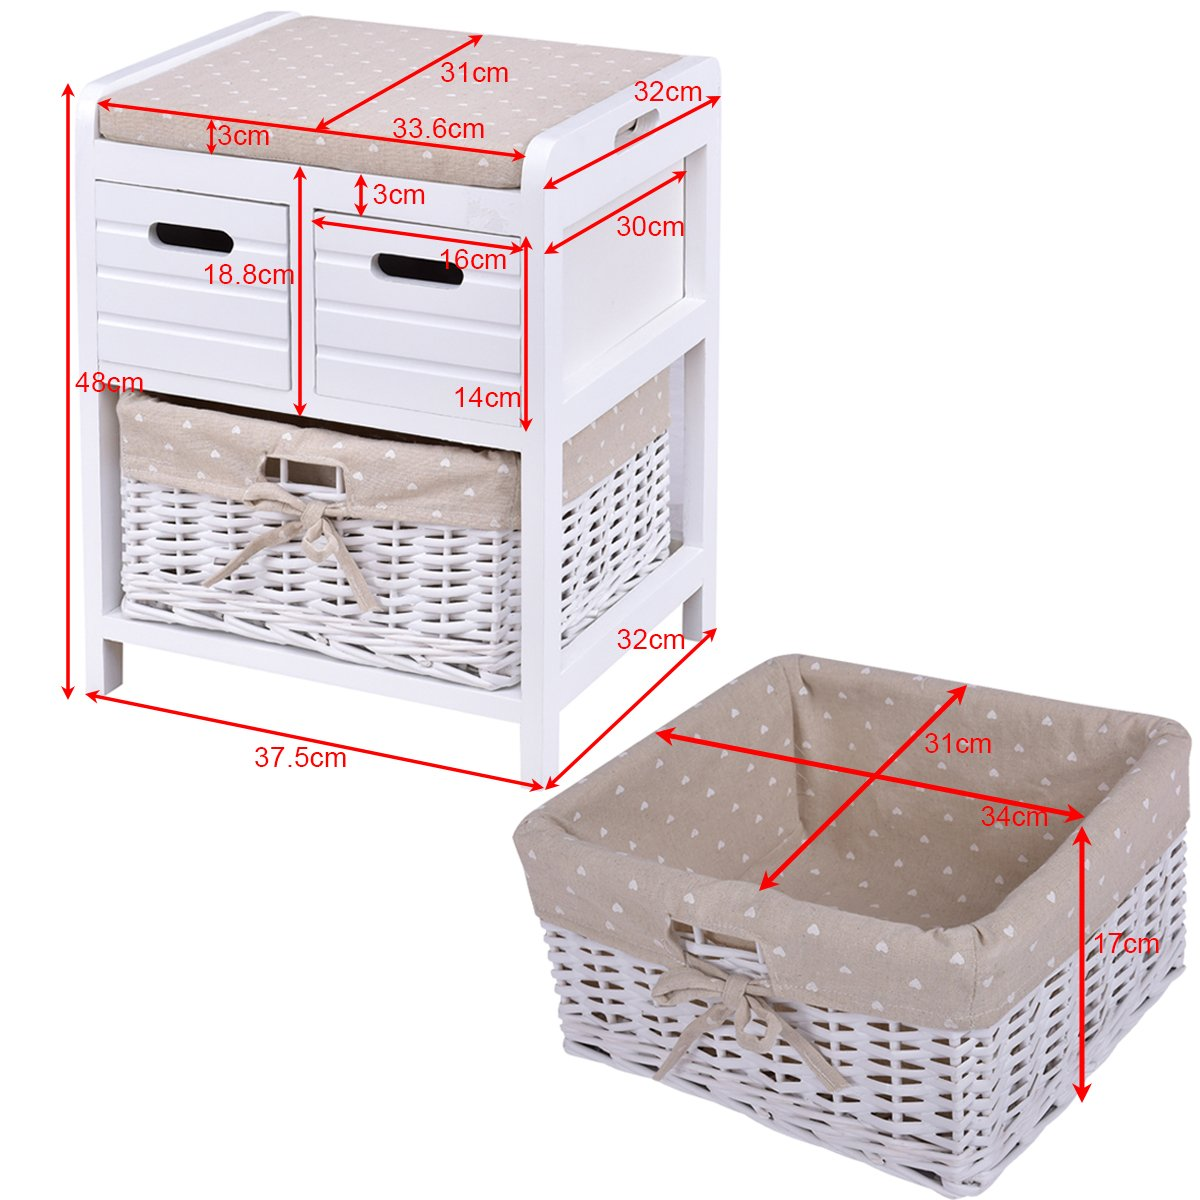 CASART Bedside Table Wooden Bench Drawer Nightstand Storage W//Rattan Basket White